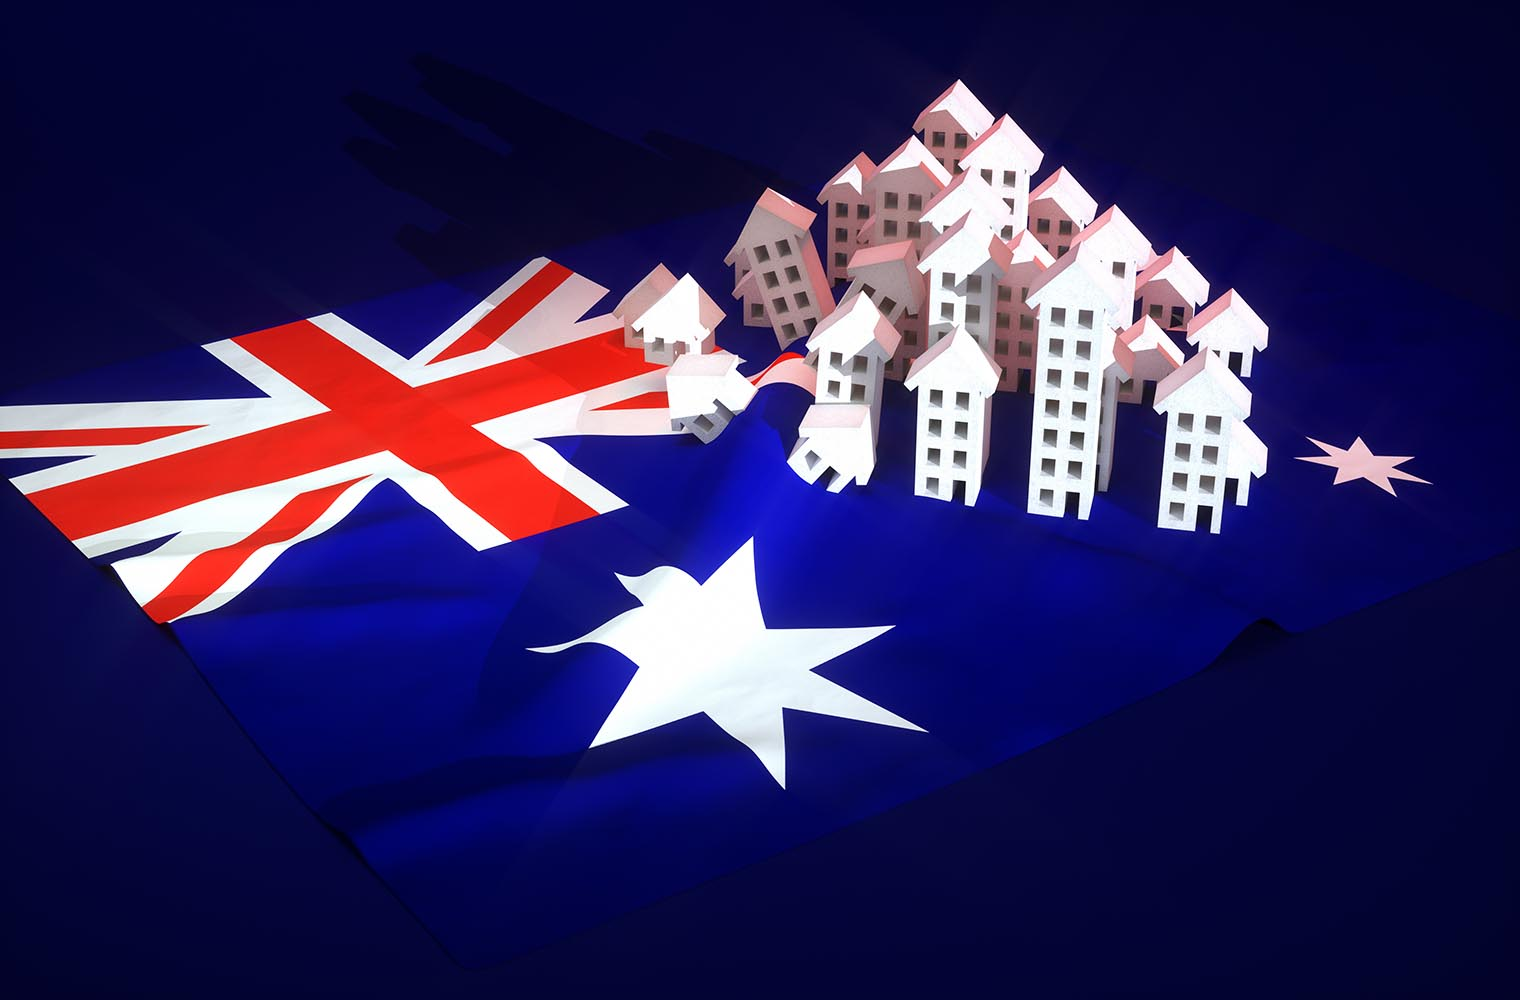 november residex property market update